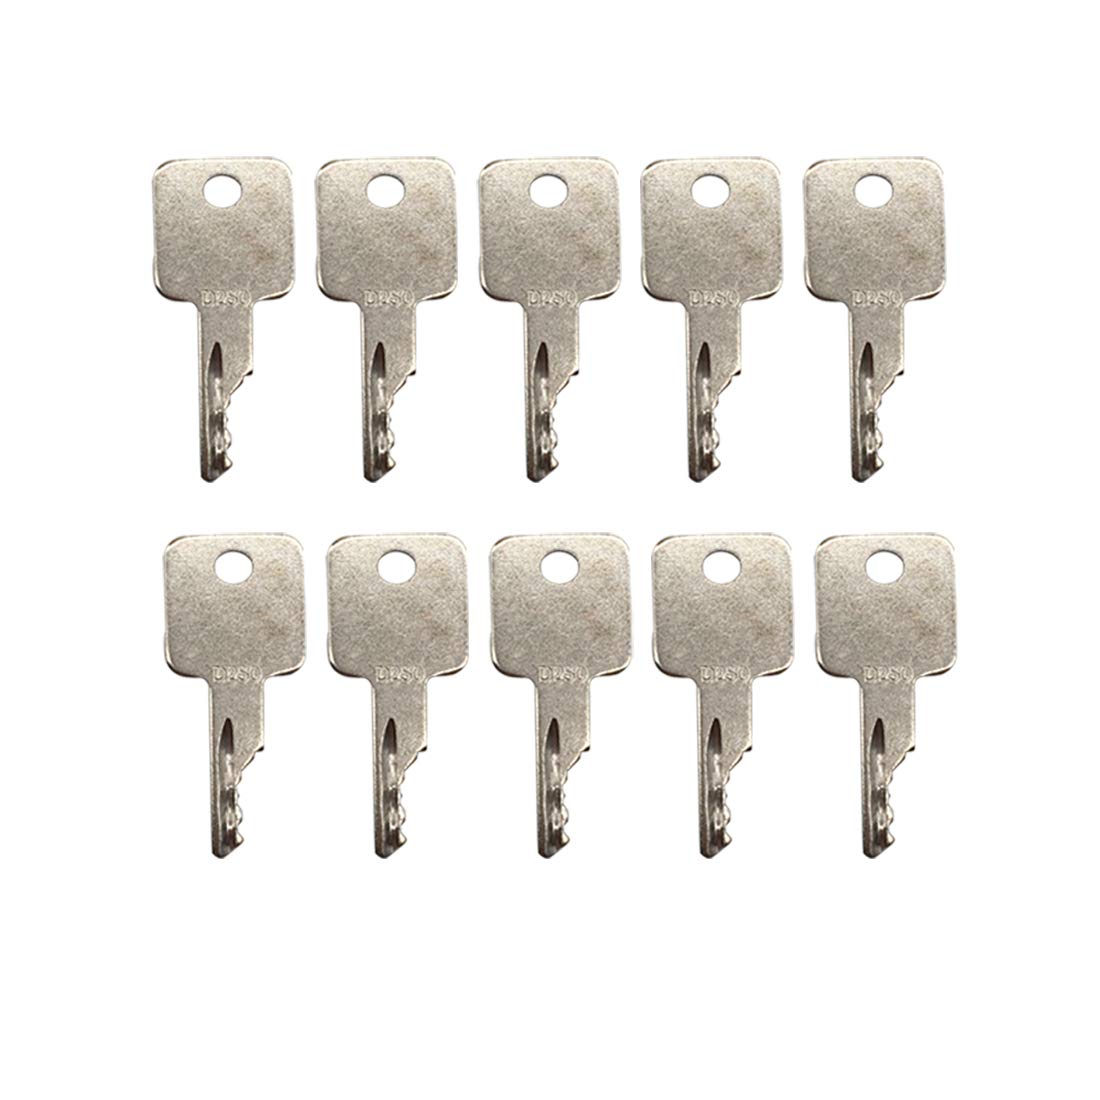 10 pcs Ignition Key D250 Replacement for Case IH Bobcat Vermeer JLG Grove Terex A77313 6693241 6709527